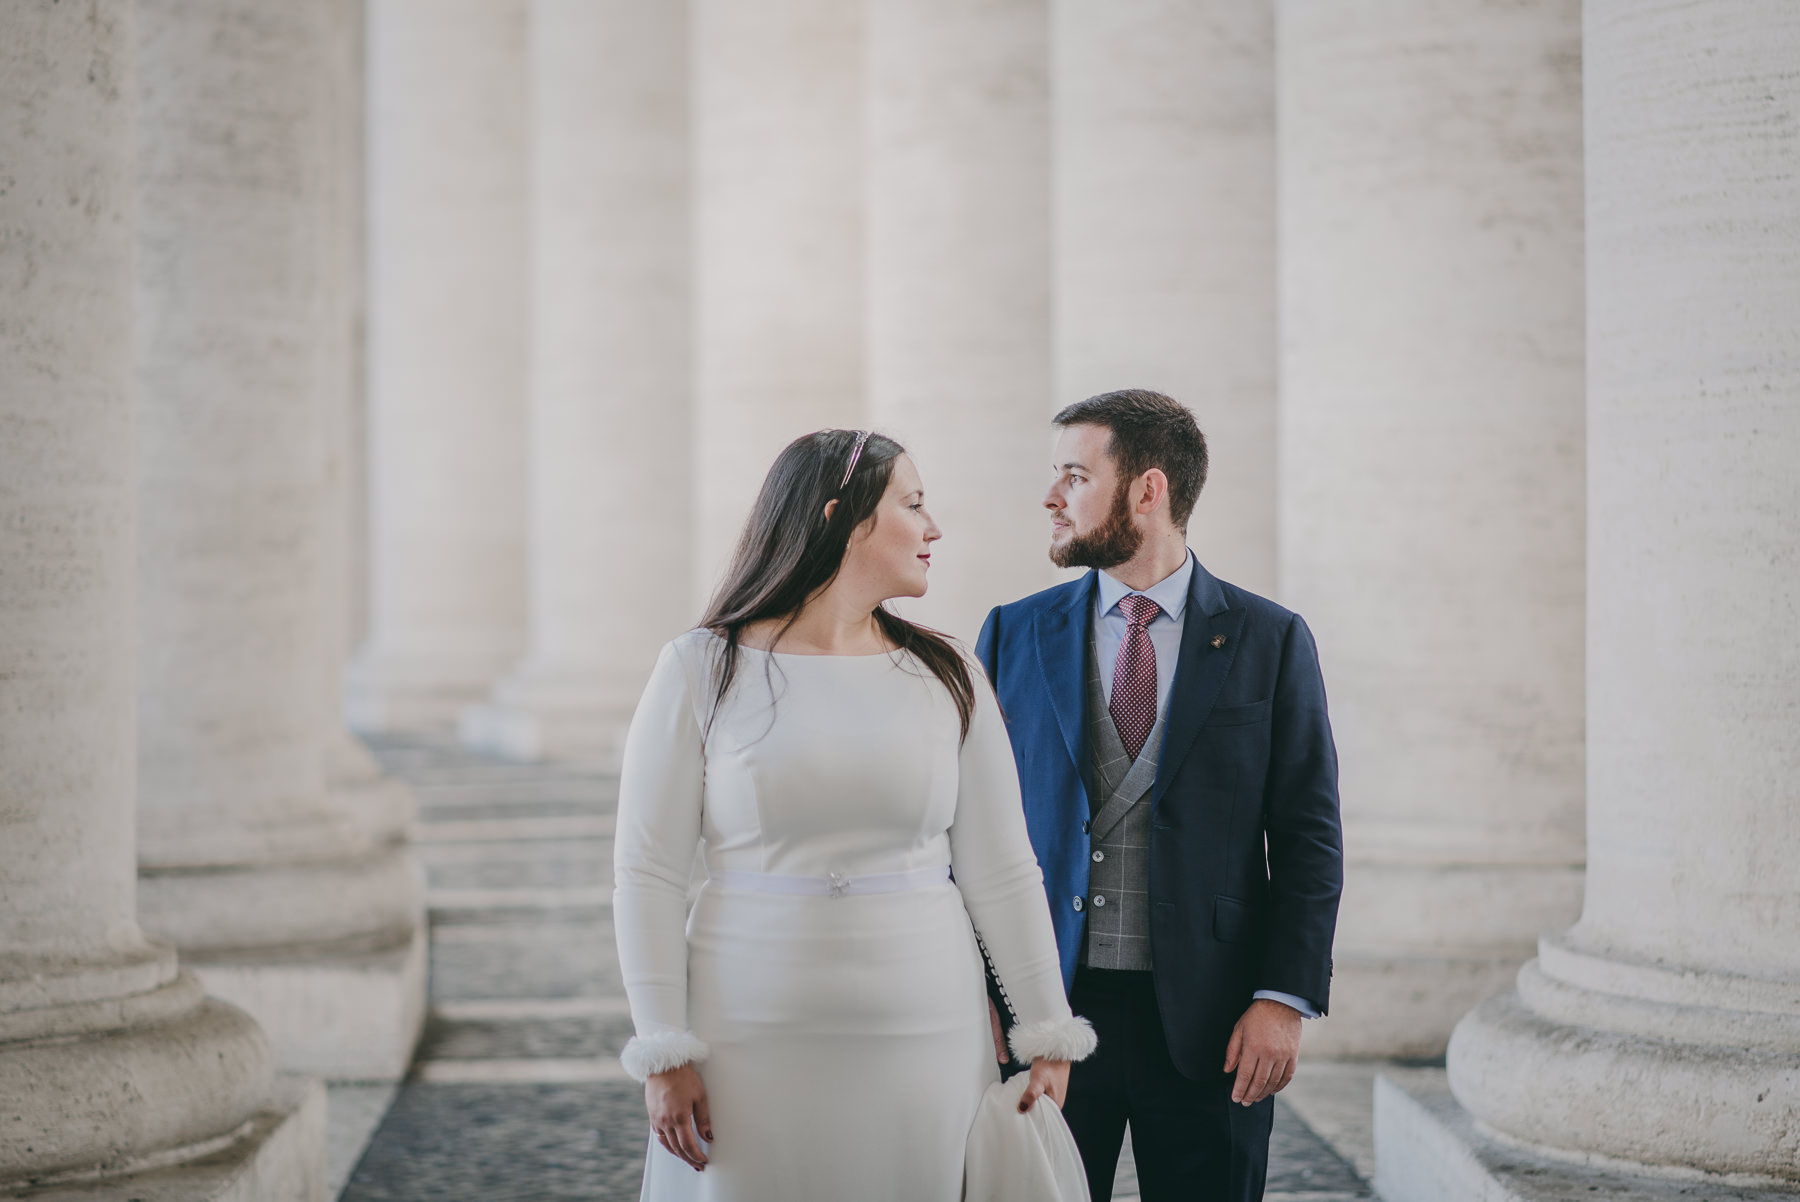 Fotografias boda Roma0016